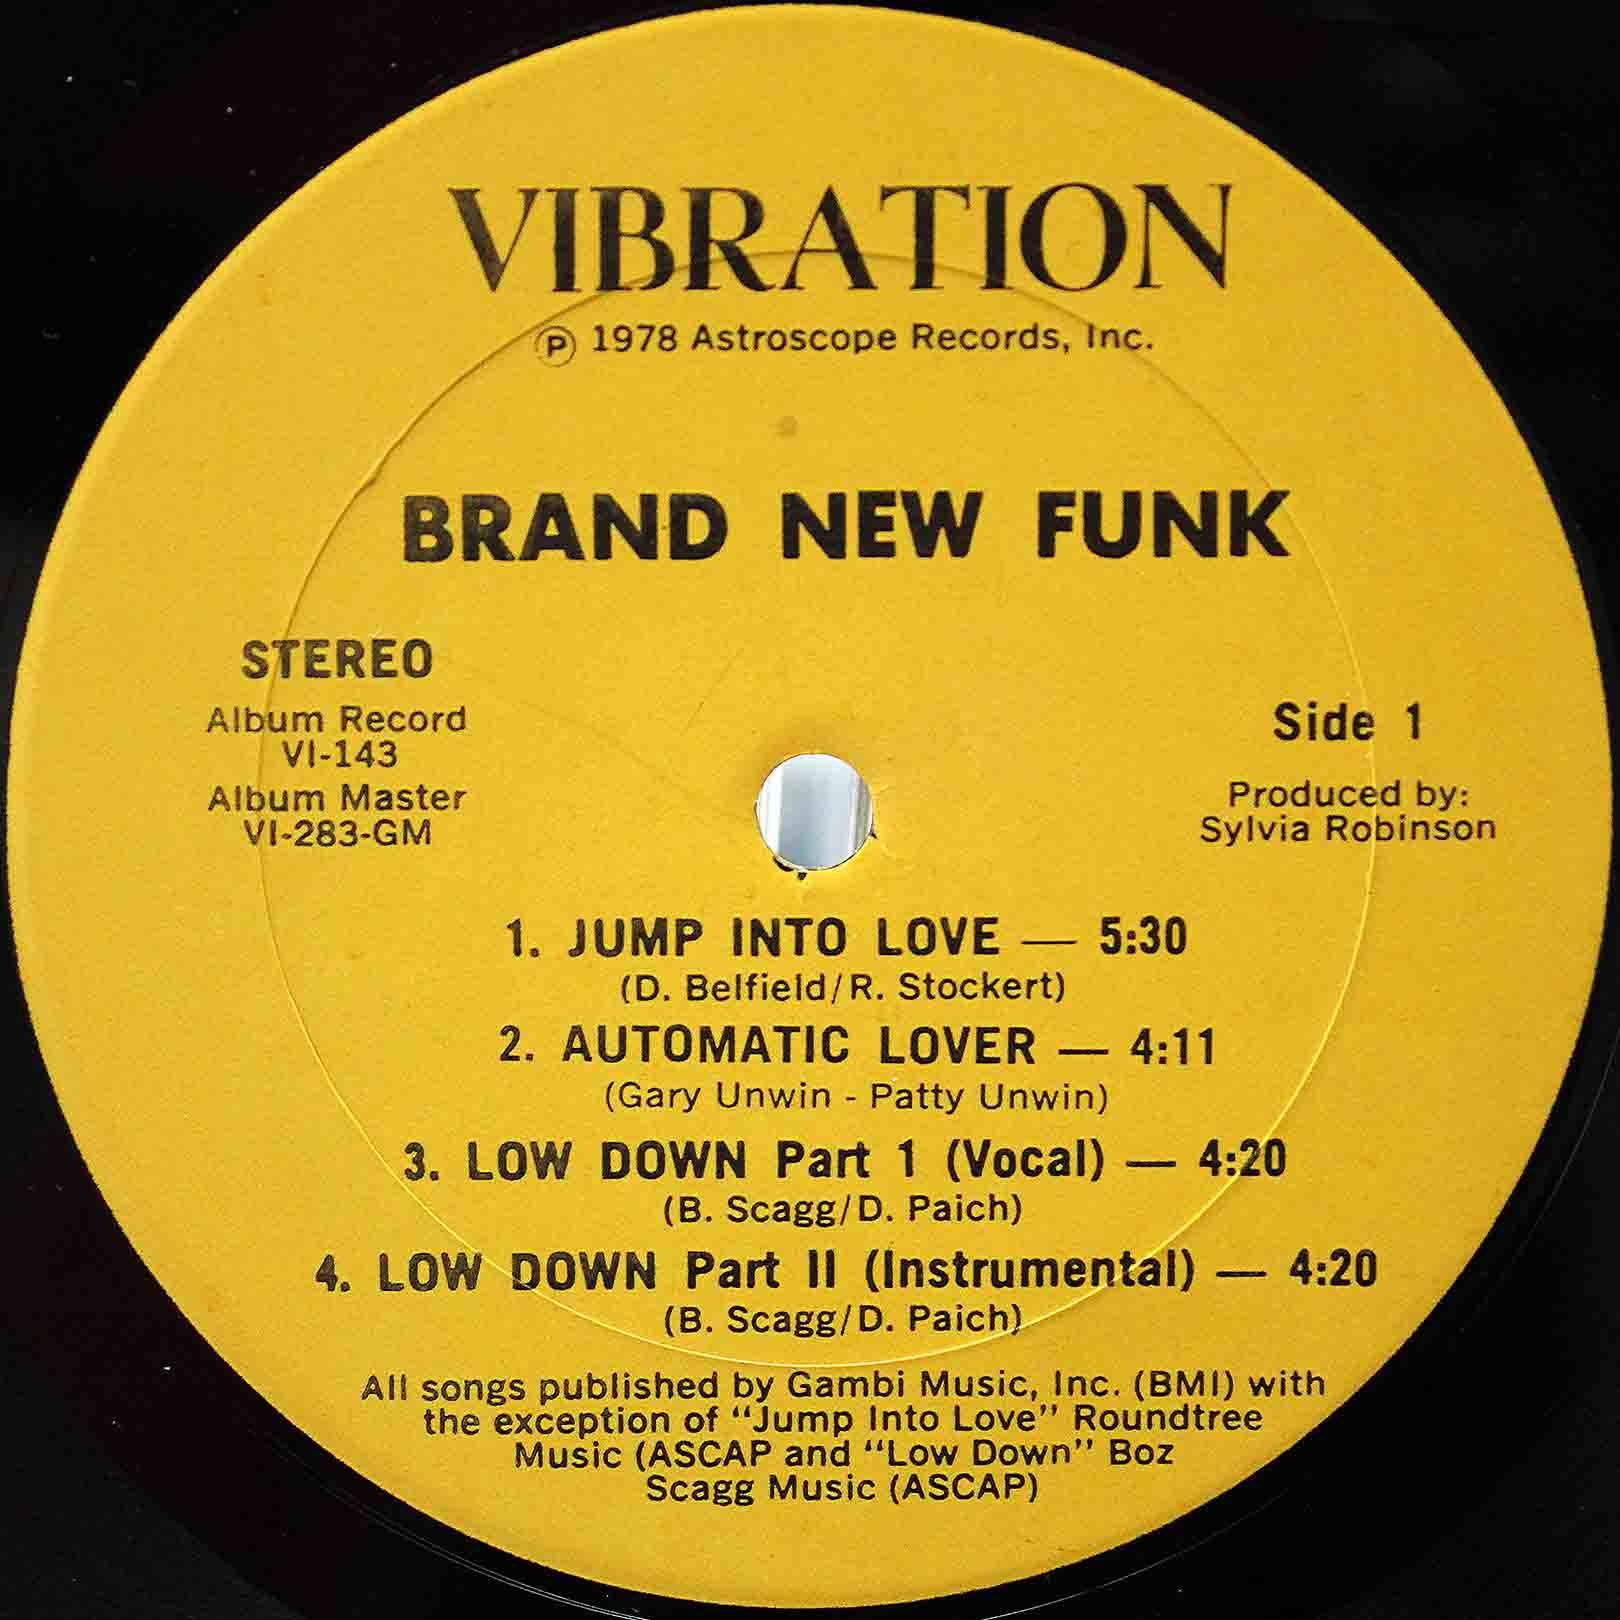 Brand New Funk 78 03